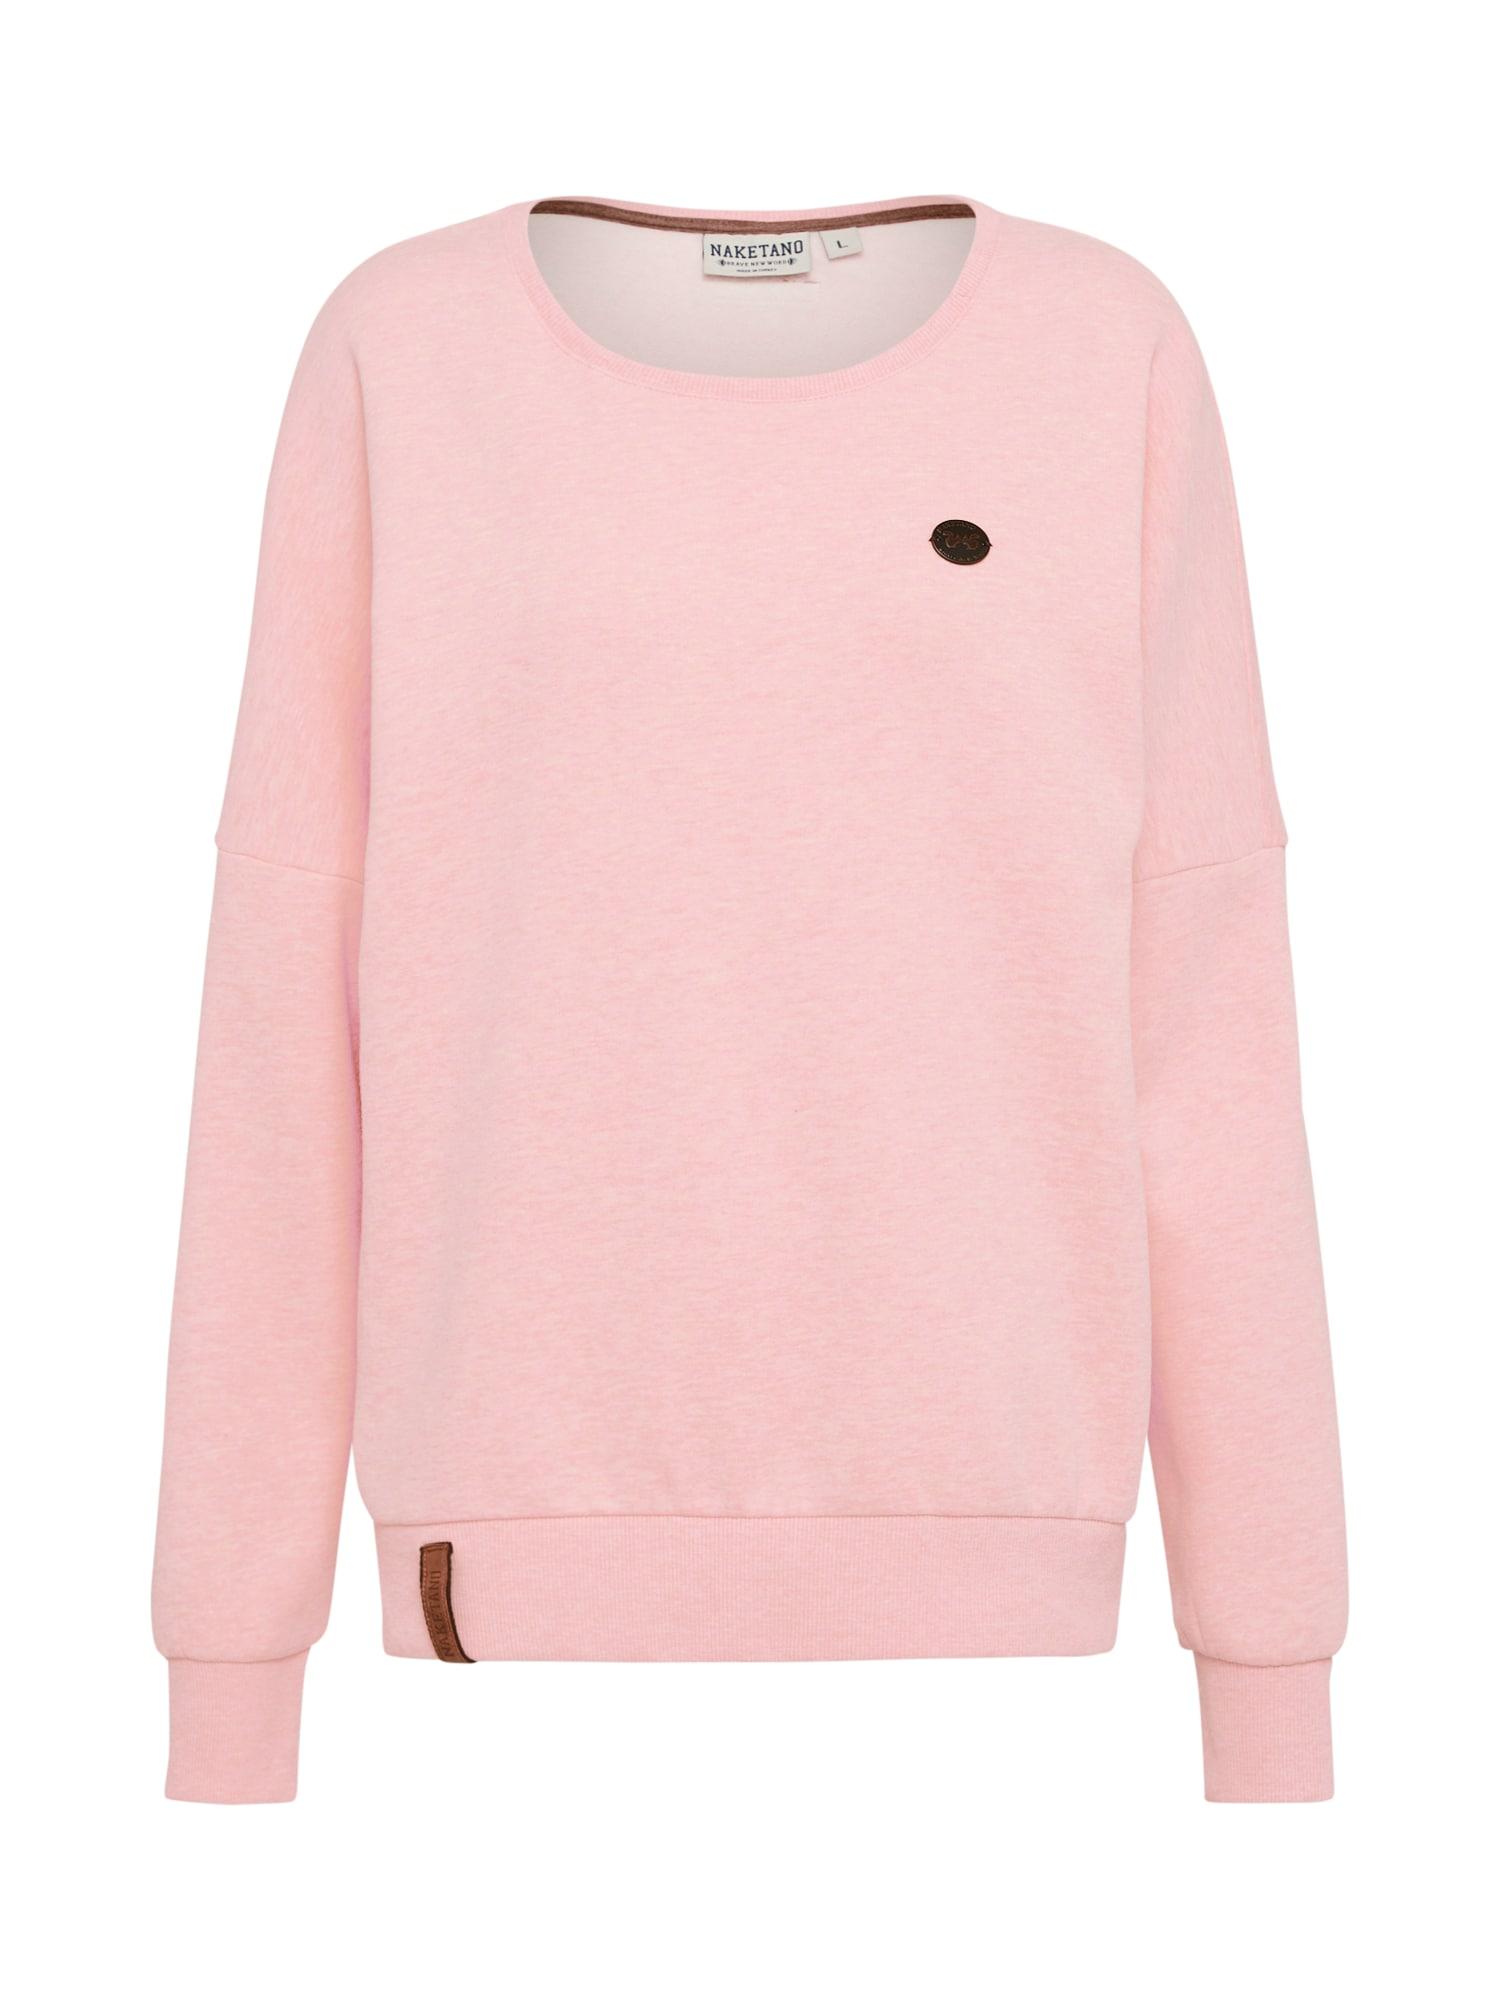 Naketano, Dames Sweatshirt '2 Stunden Sikis Sport', roze gemleerd